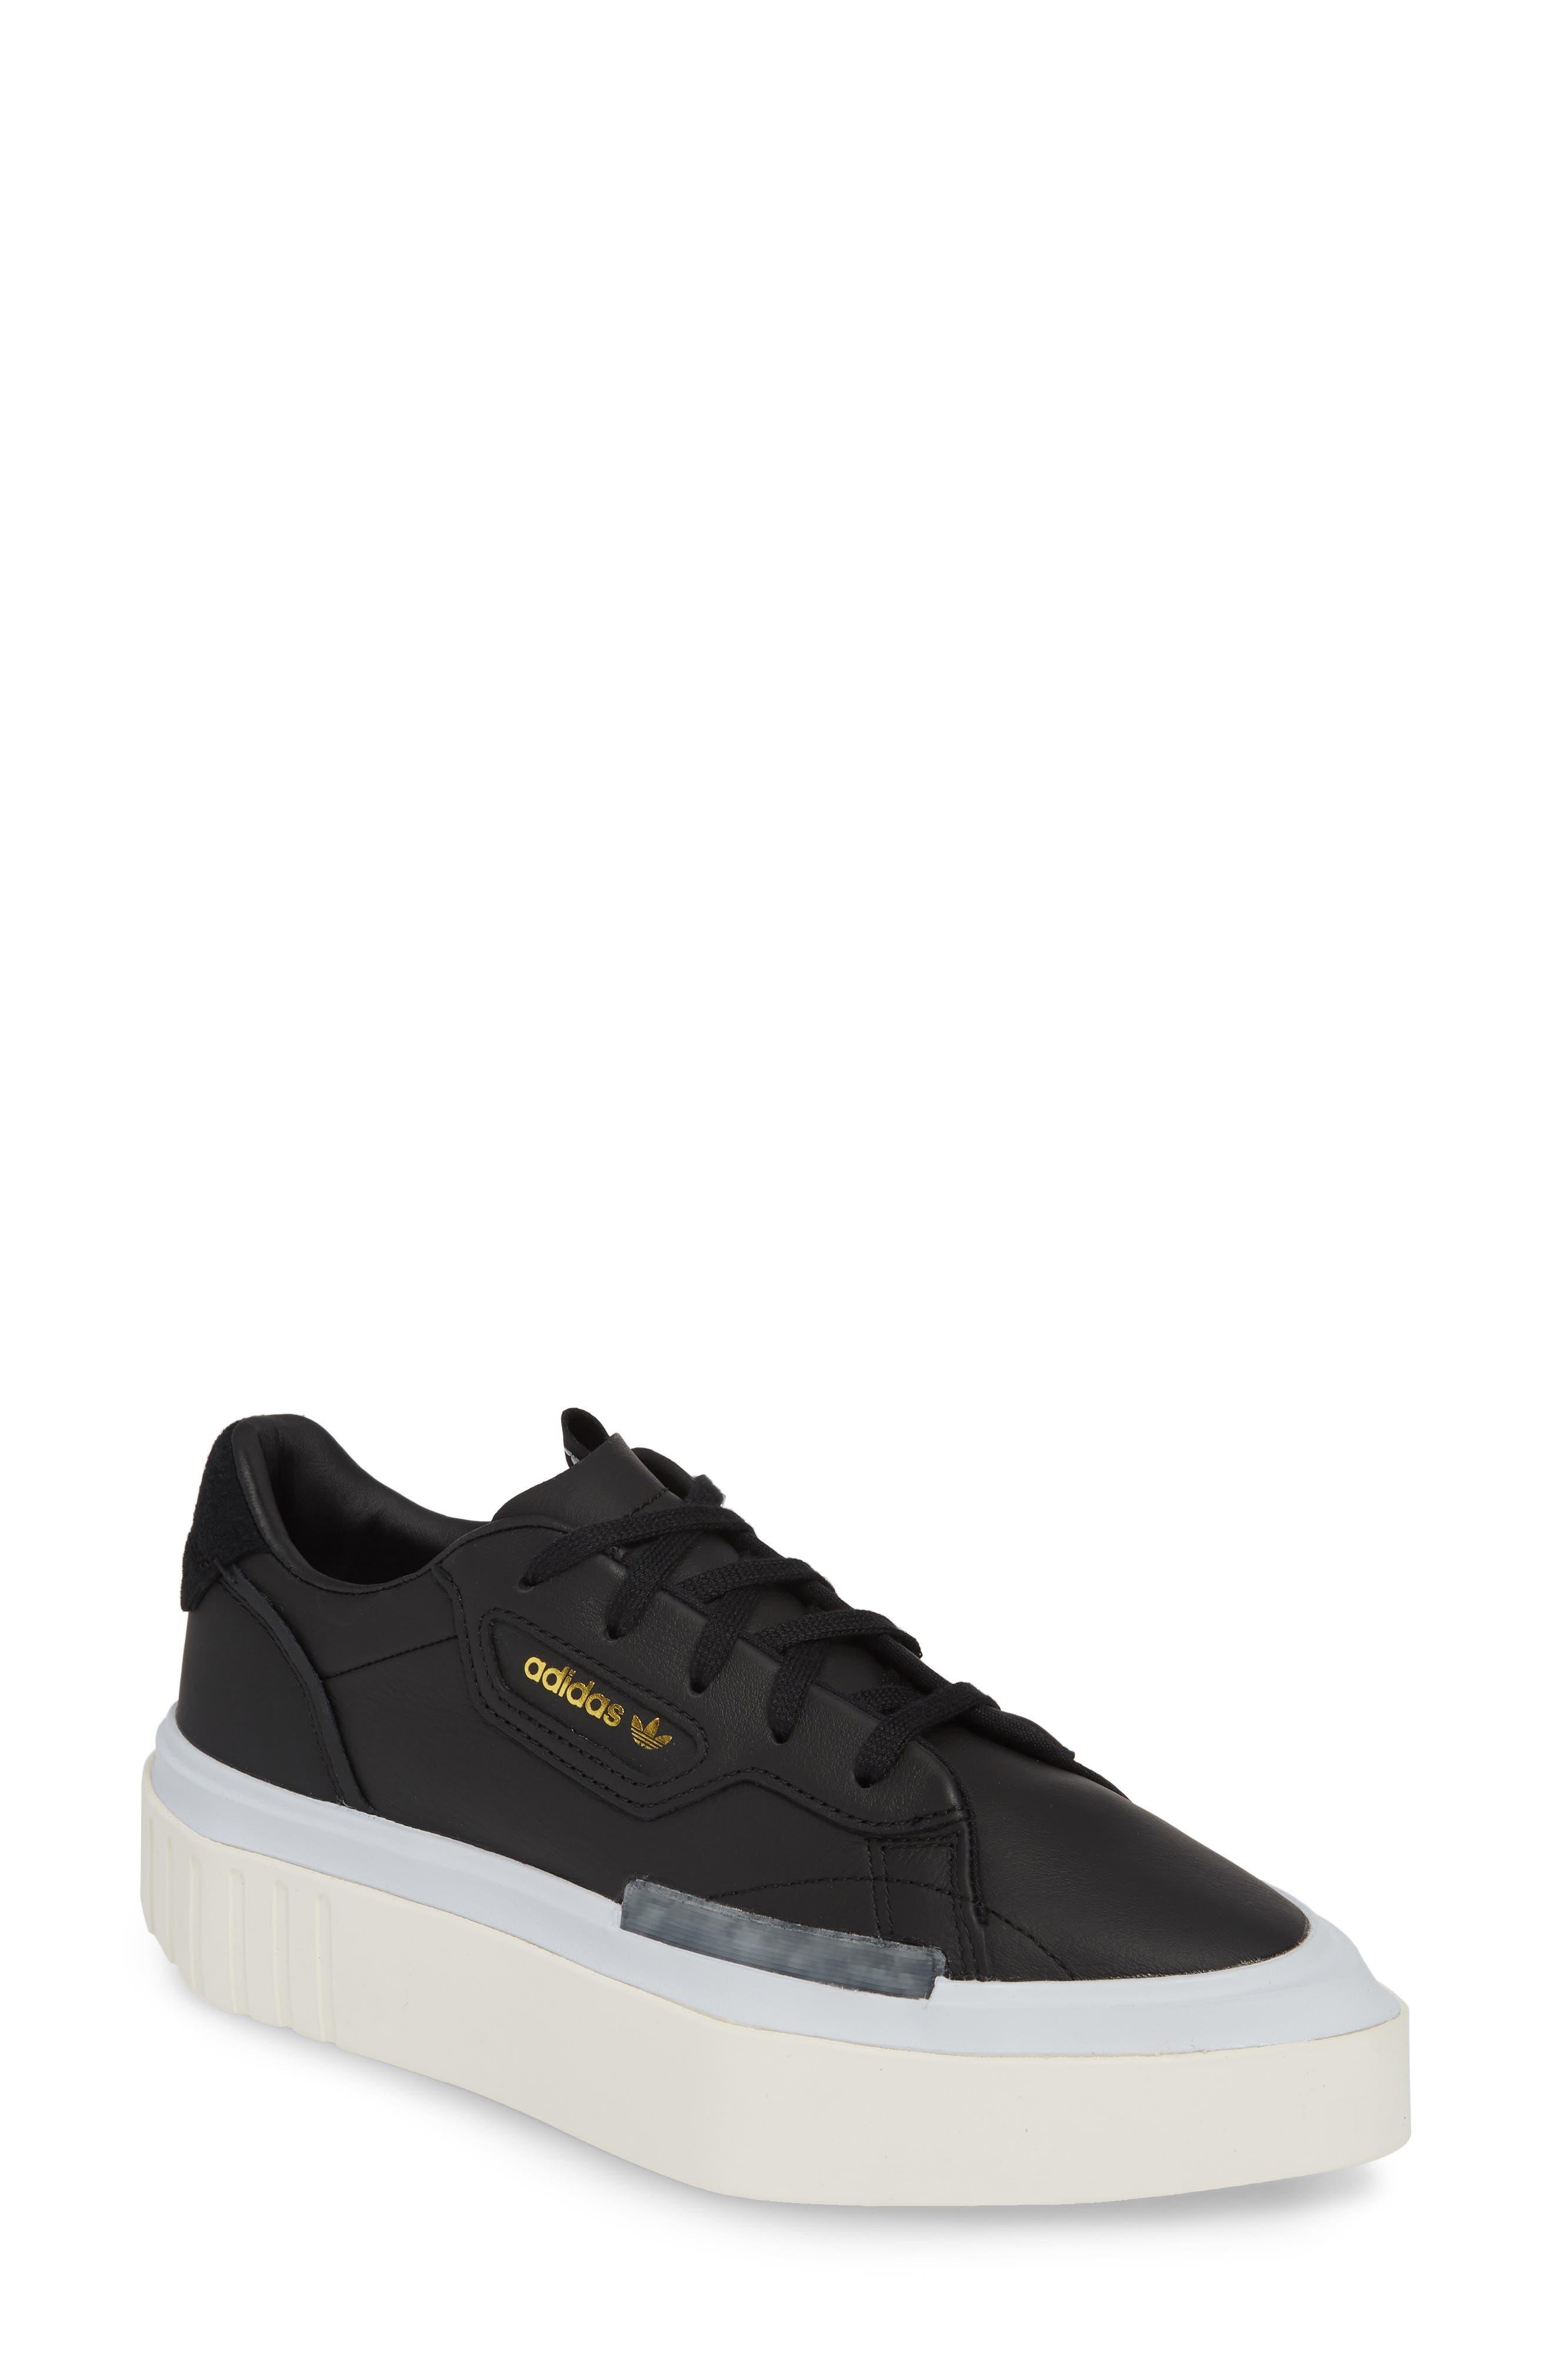 Hypersleek Platform Sneaker, Main, color, CORE BLACK/ AERO BLUE